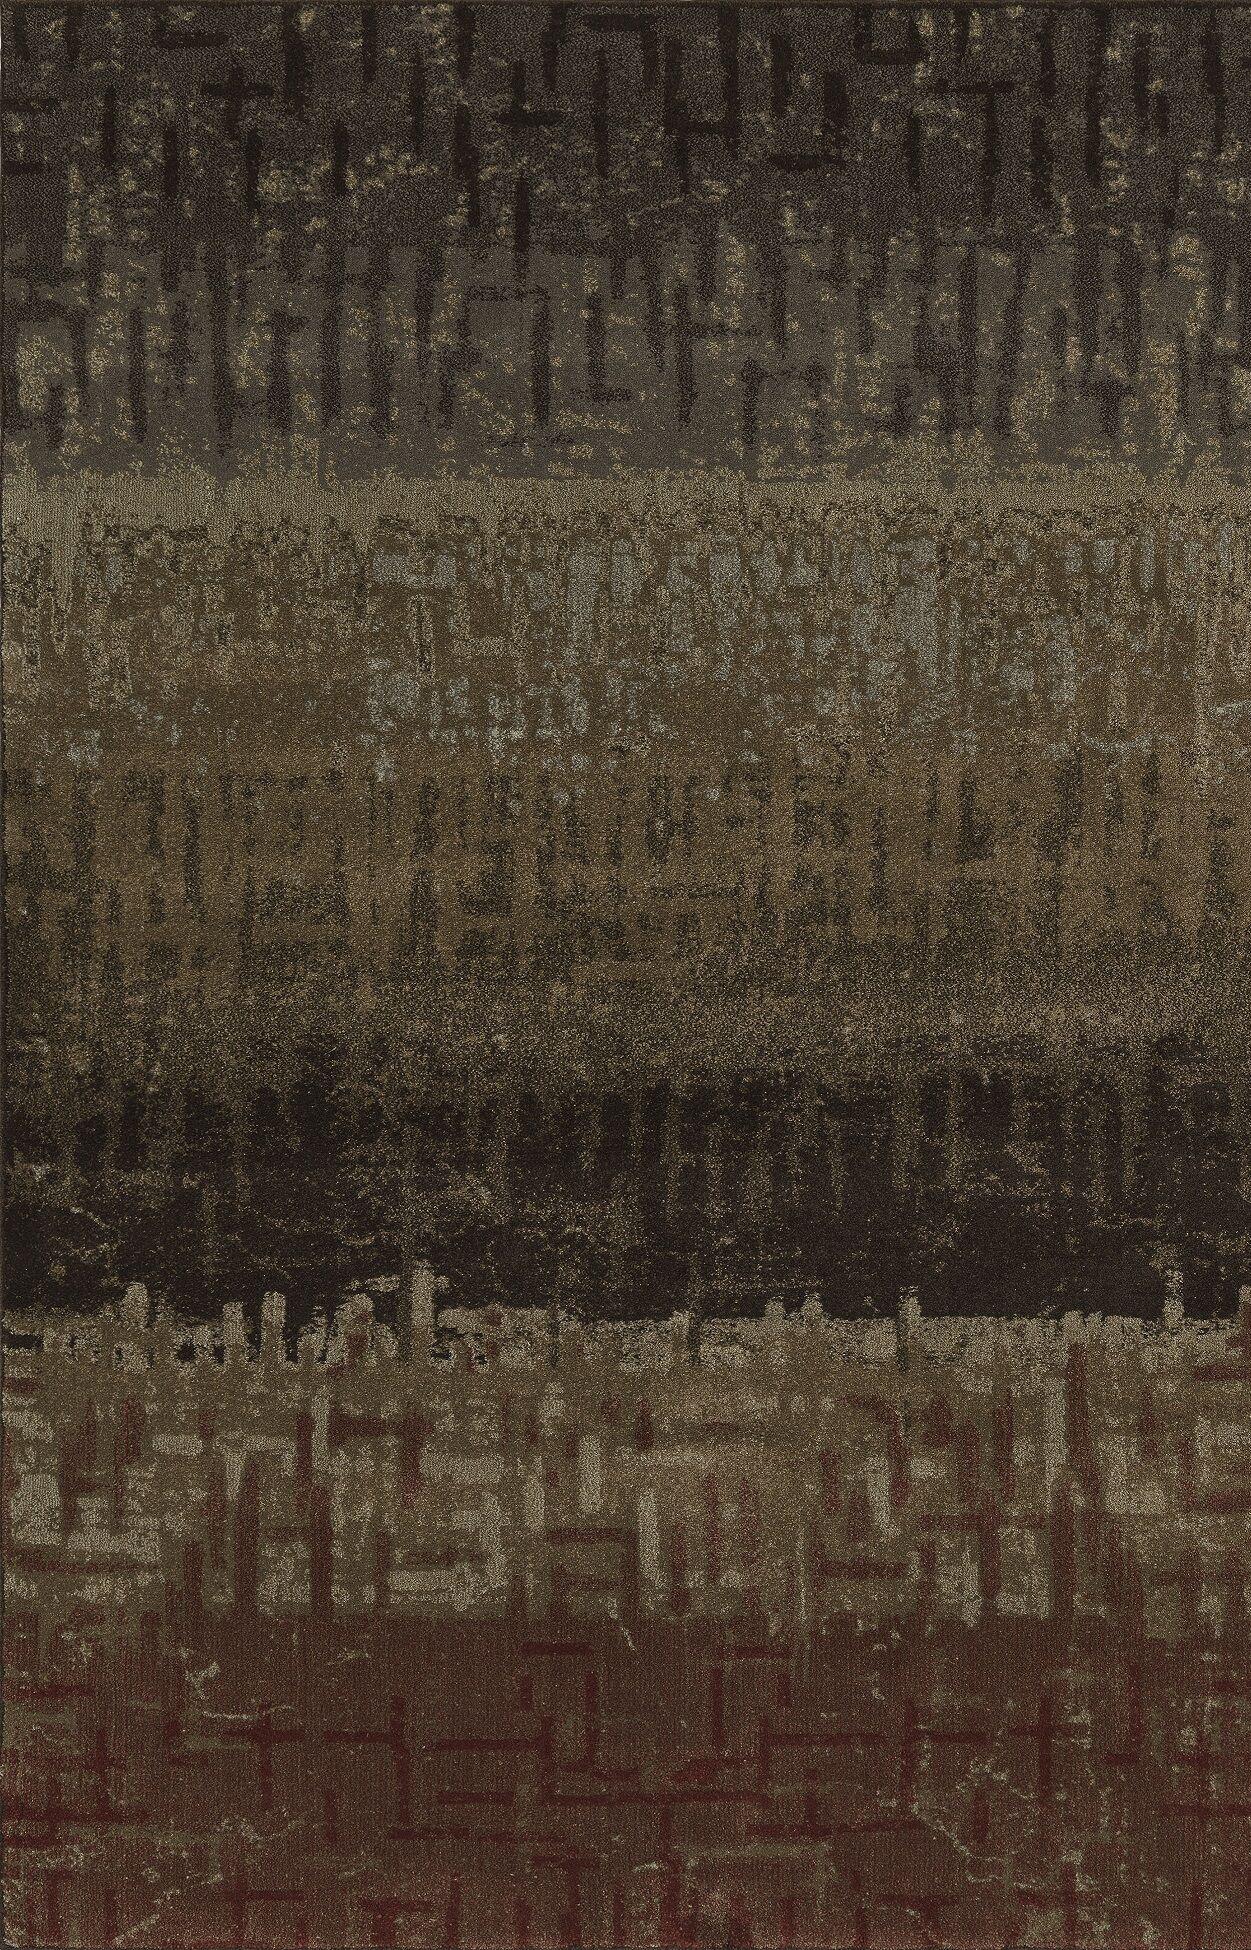 Upton Gray/Brown Area Rug Rug Size: Rectangle 5'3